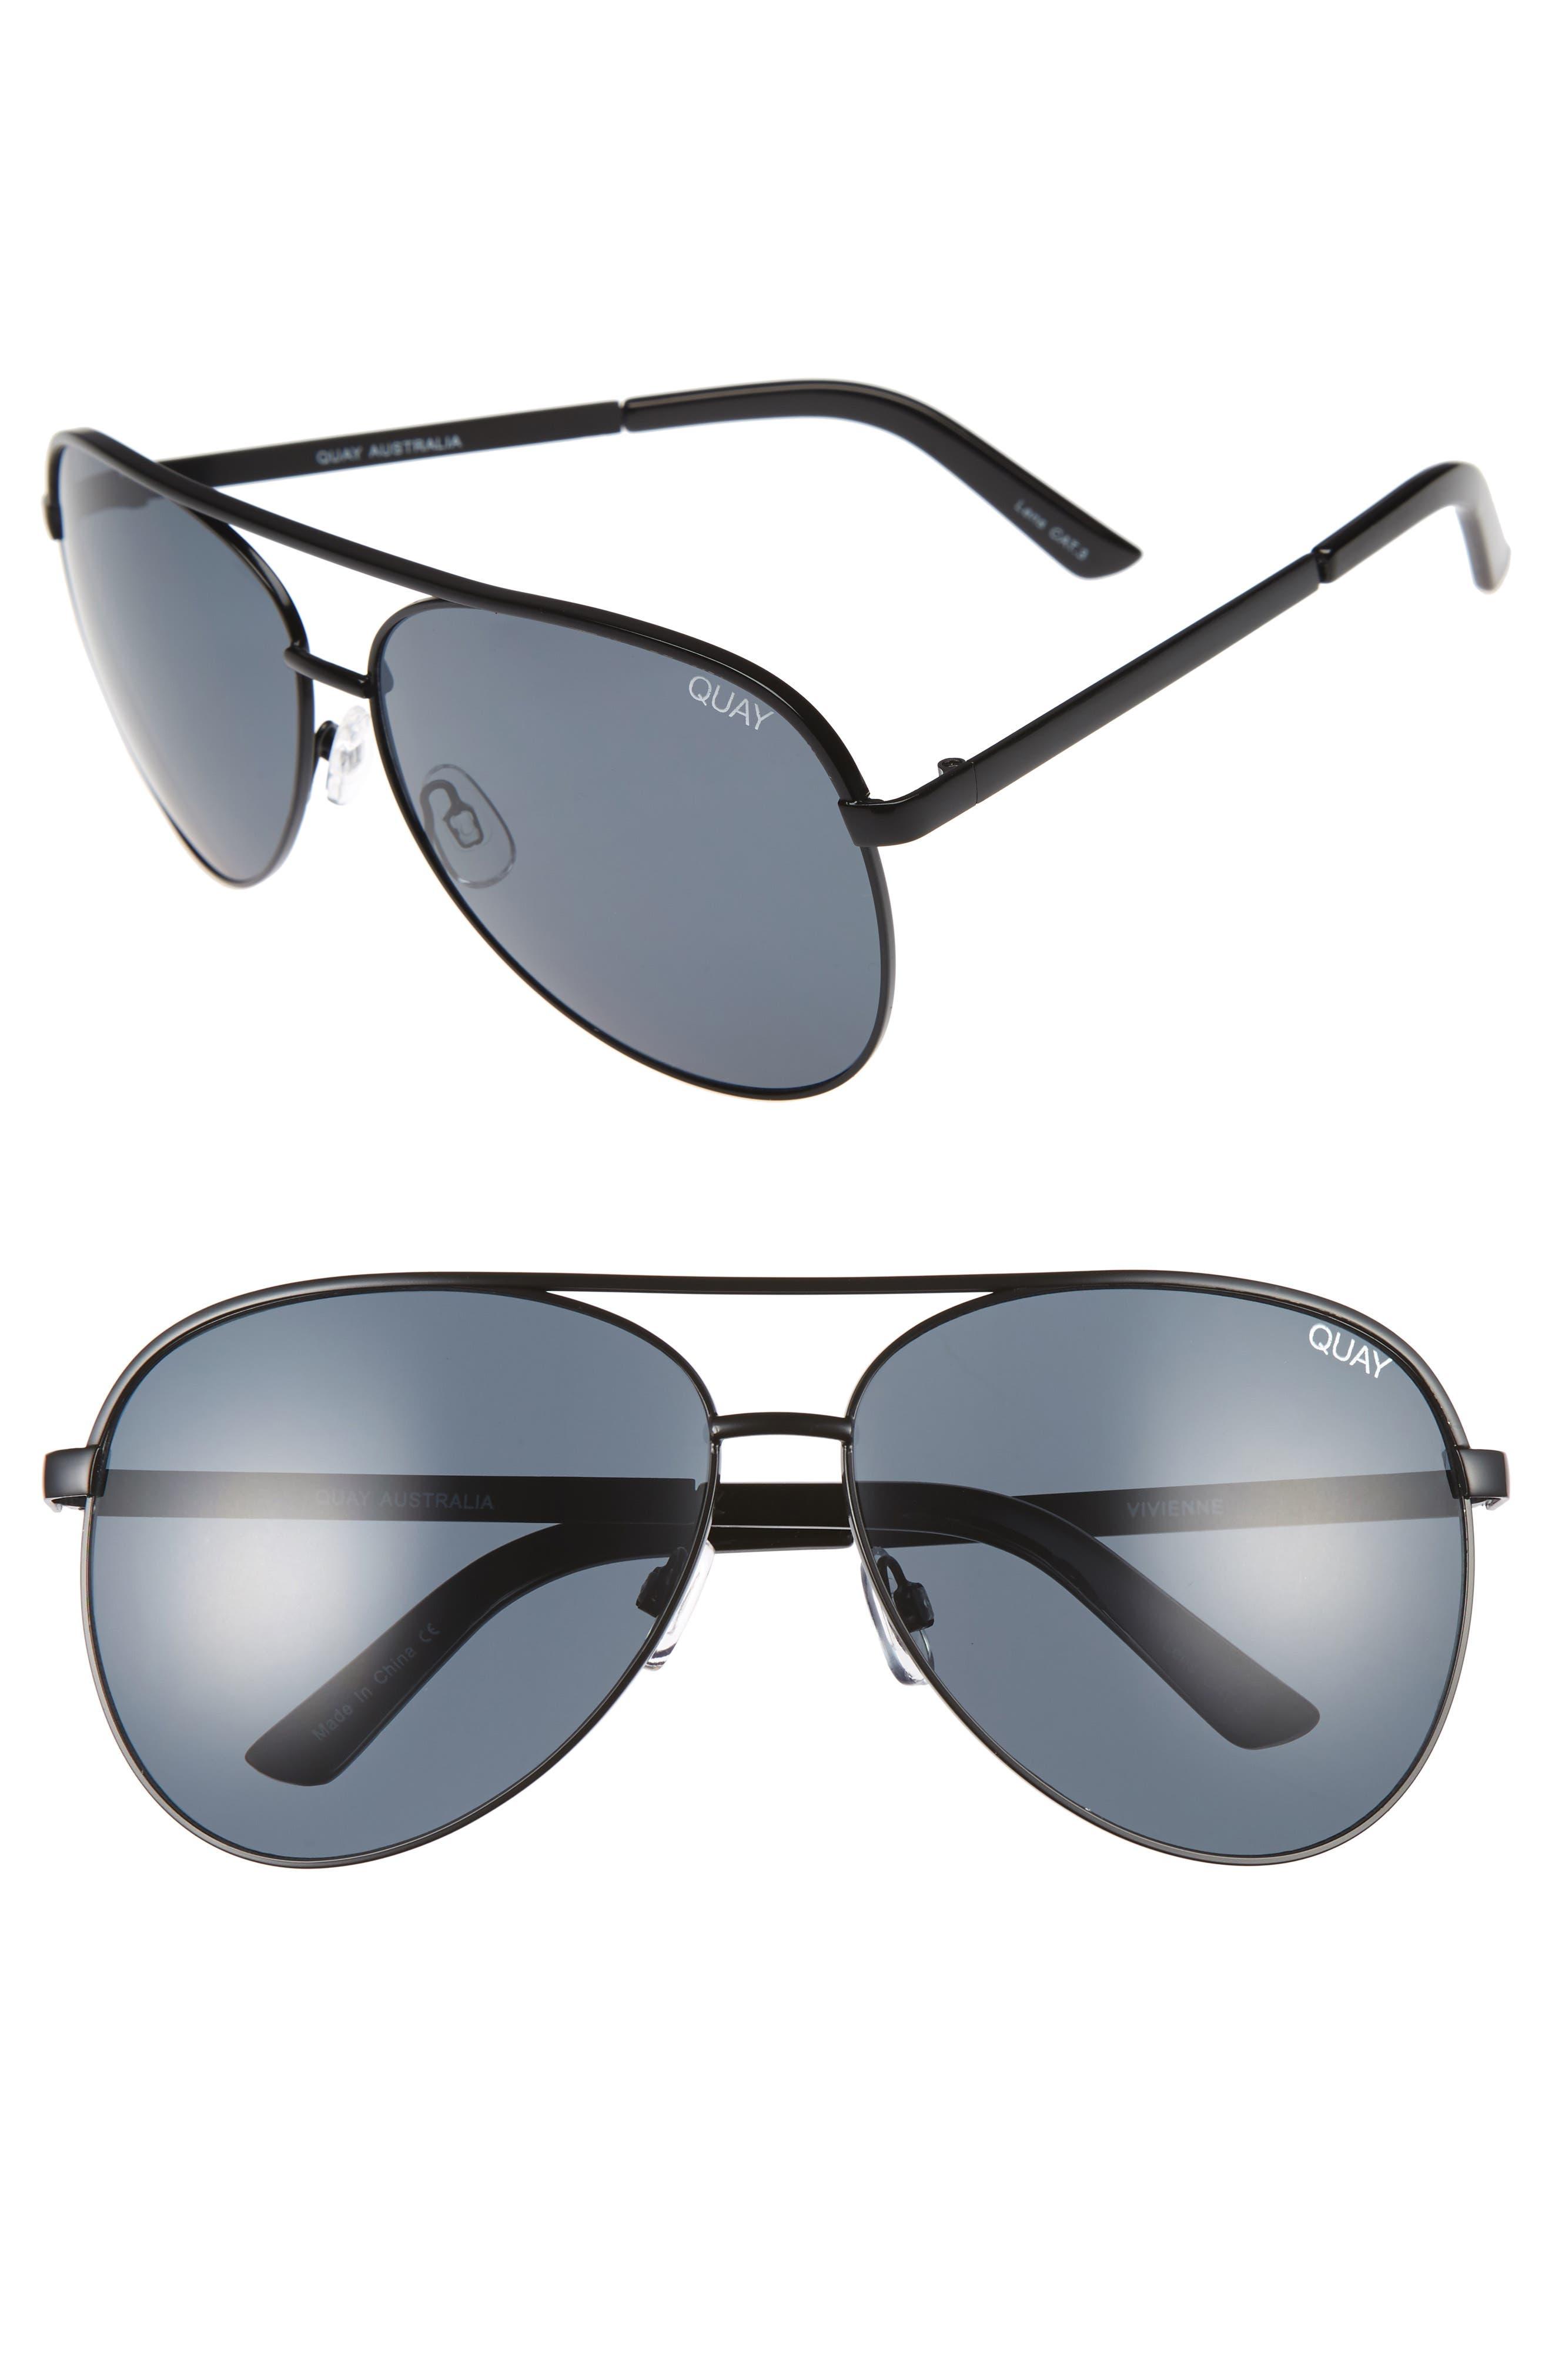 Vivienne 64mm Aviator Sunglasses,                         Main,                         color, BLACK/ SMOKE